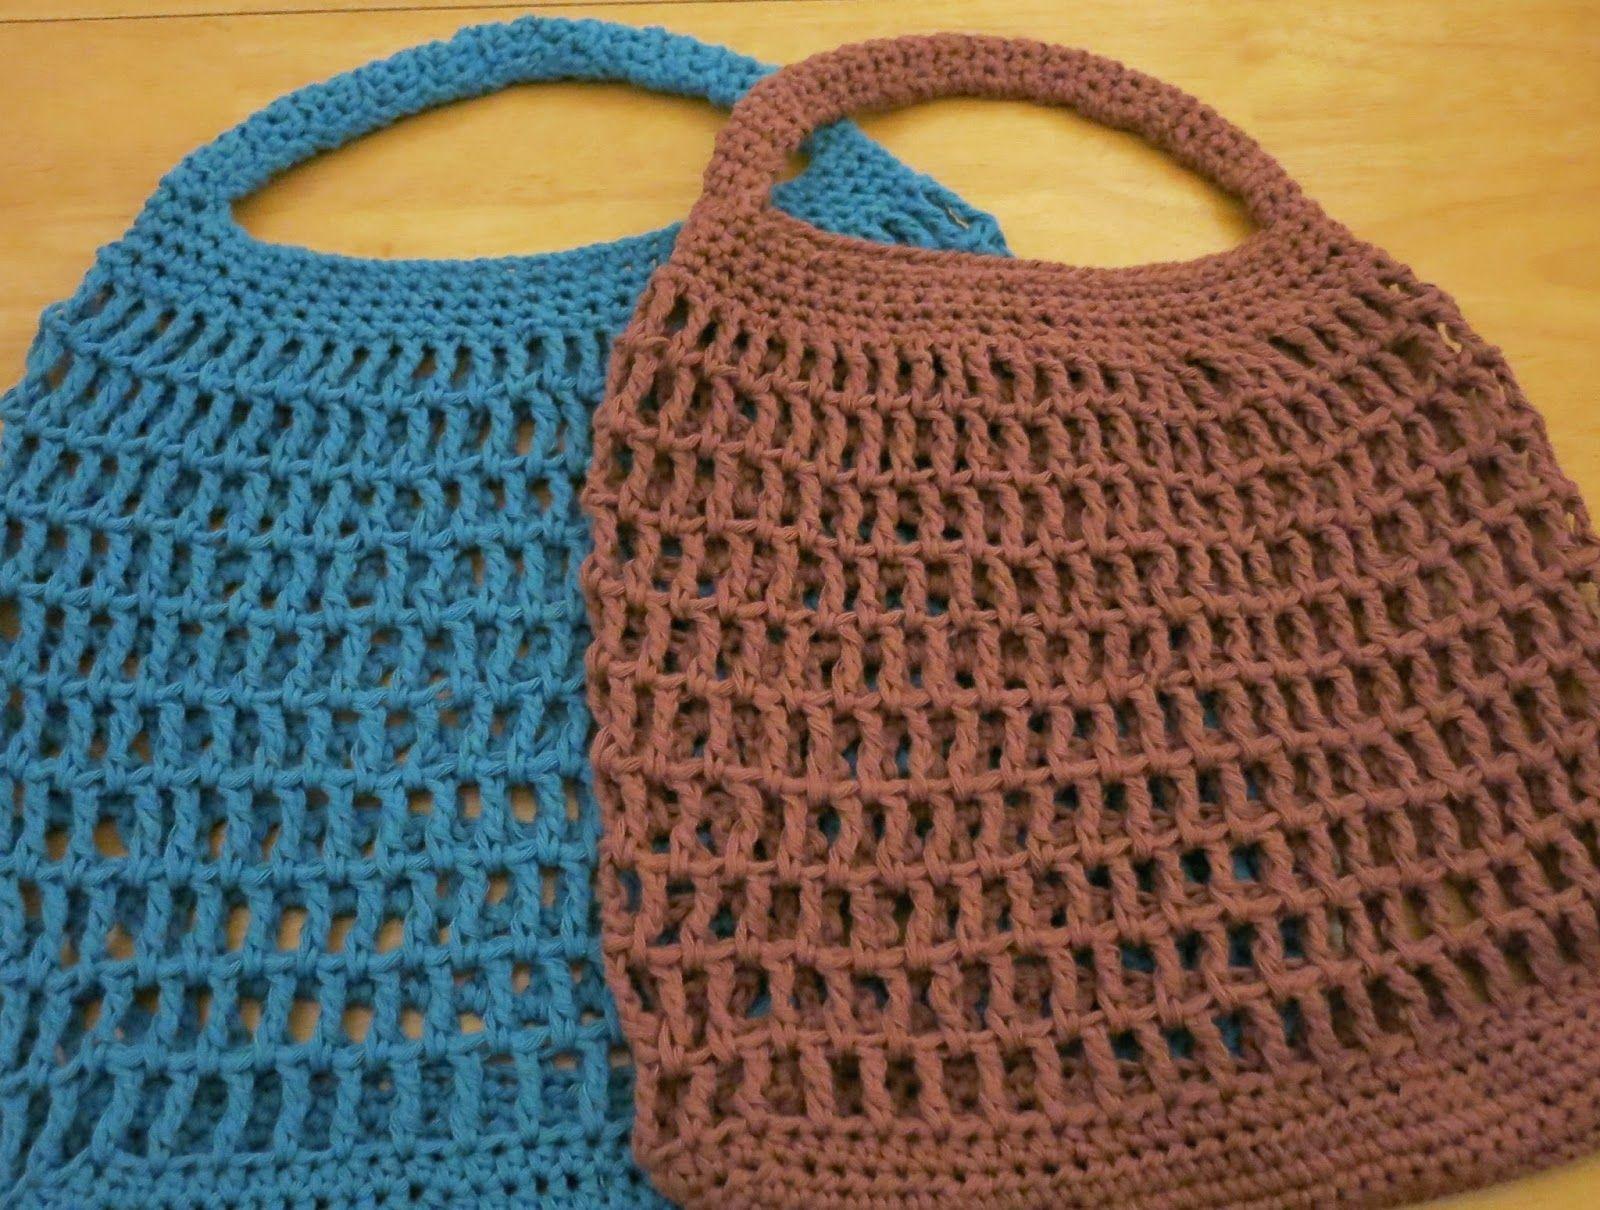 Crochet Market bags Free pattern-Da\'s Crochet Connection | Hook and ...